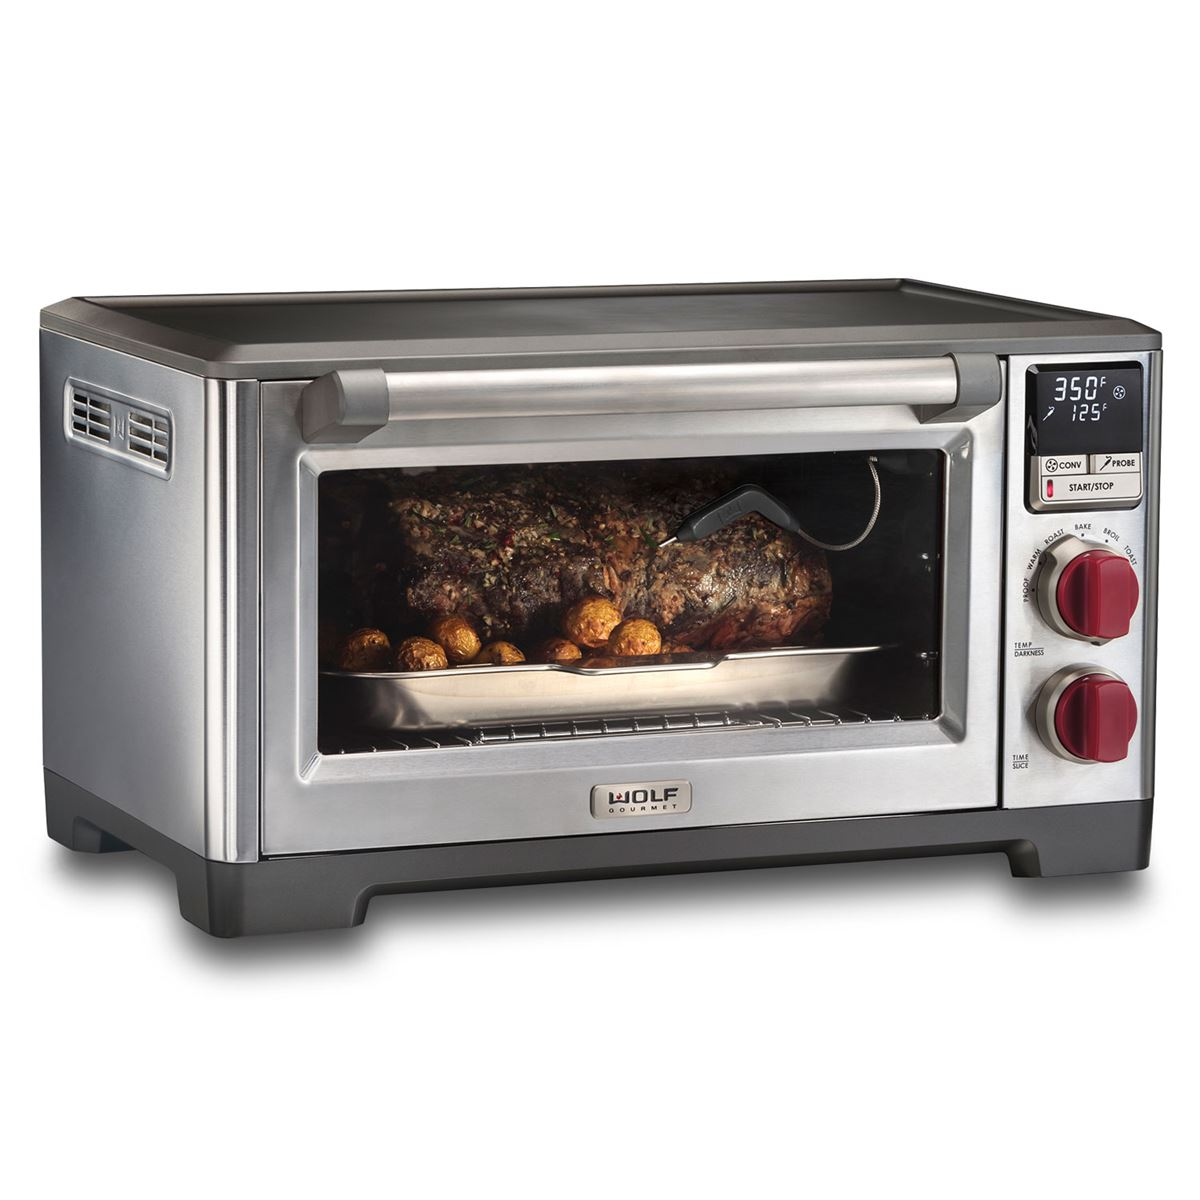 Countertop Dishwasher Future Shop : Countertop Oven